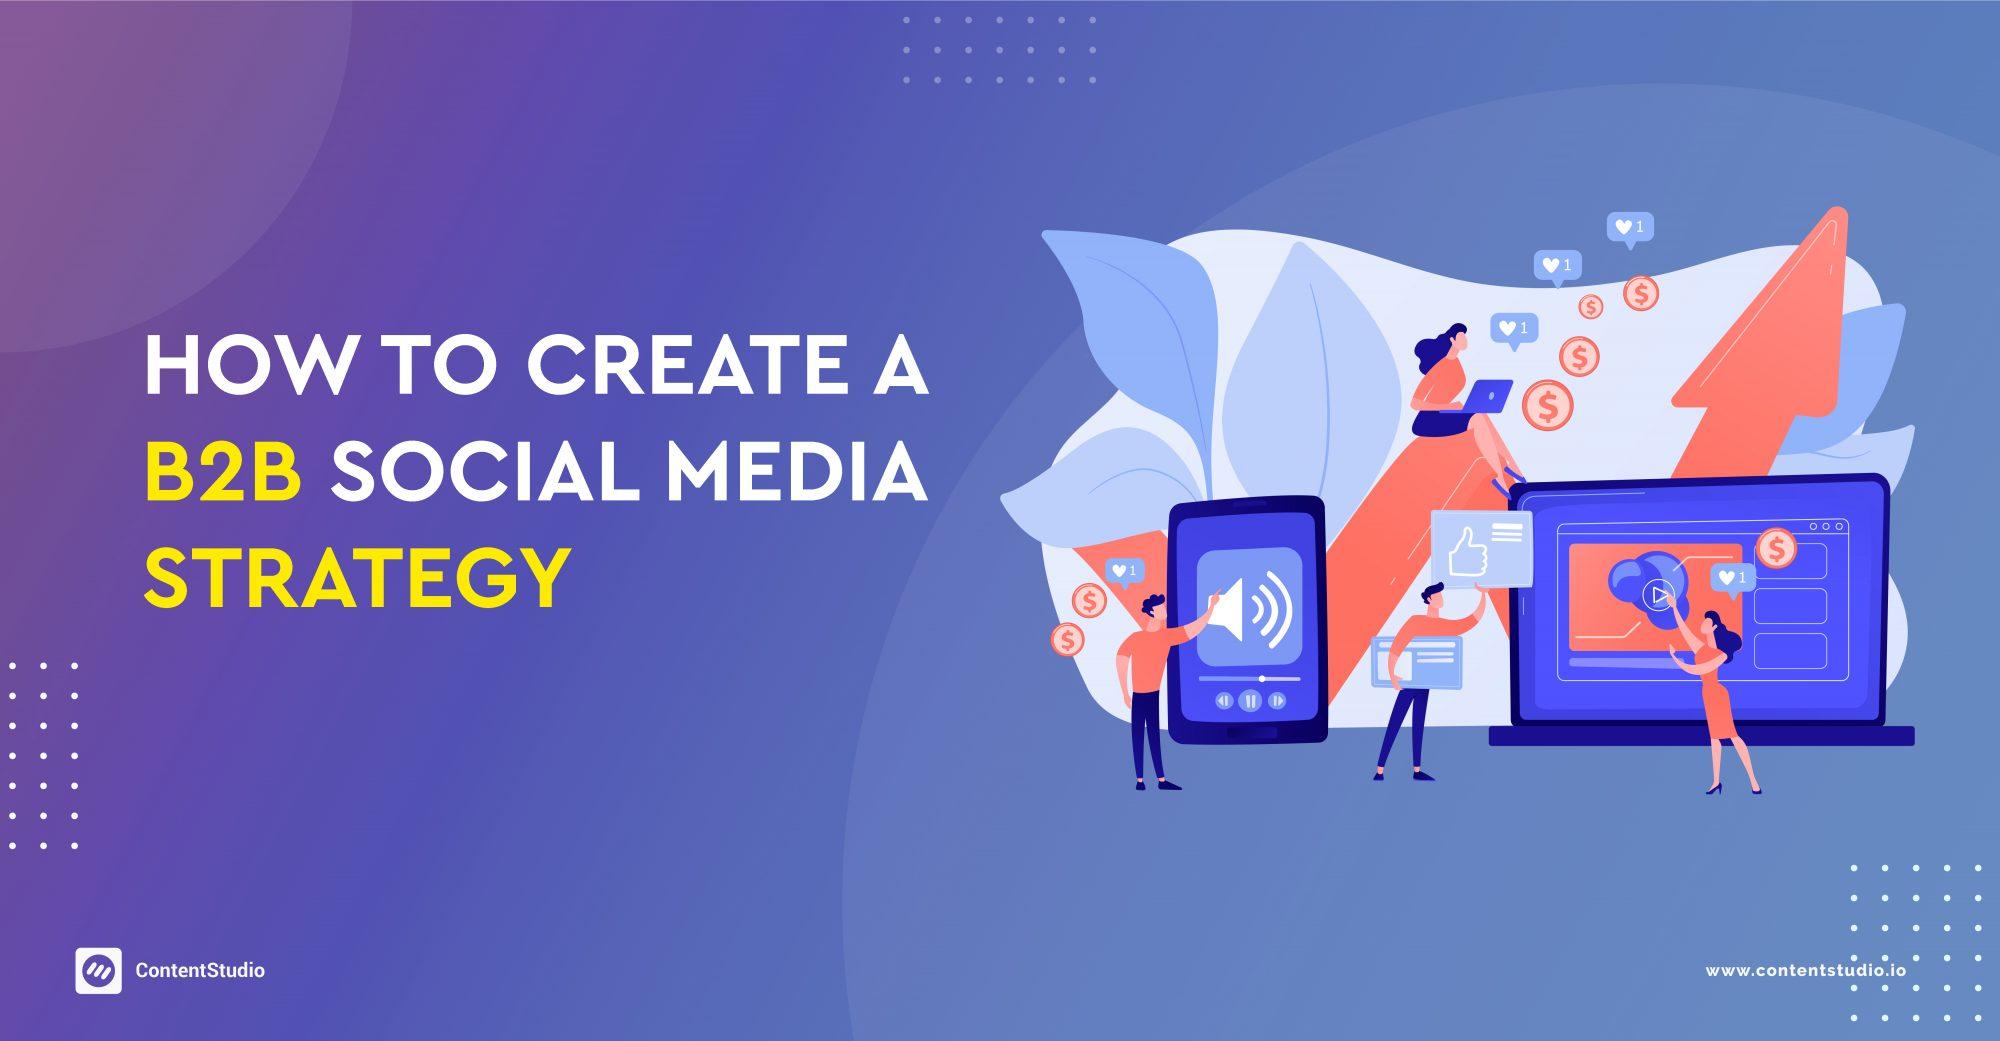 How to create a b2b social media strategy